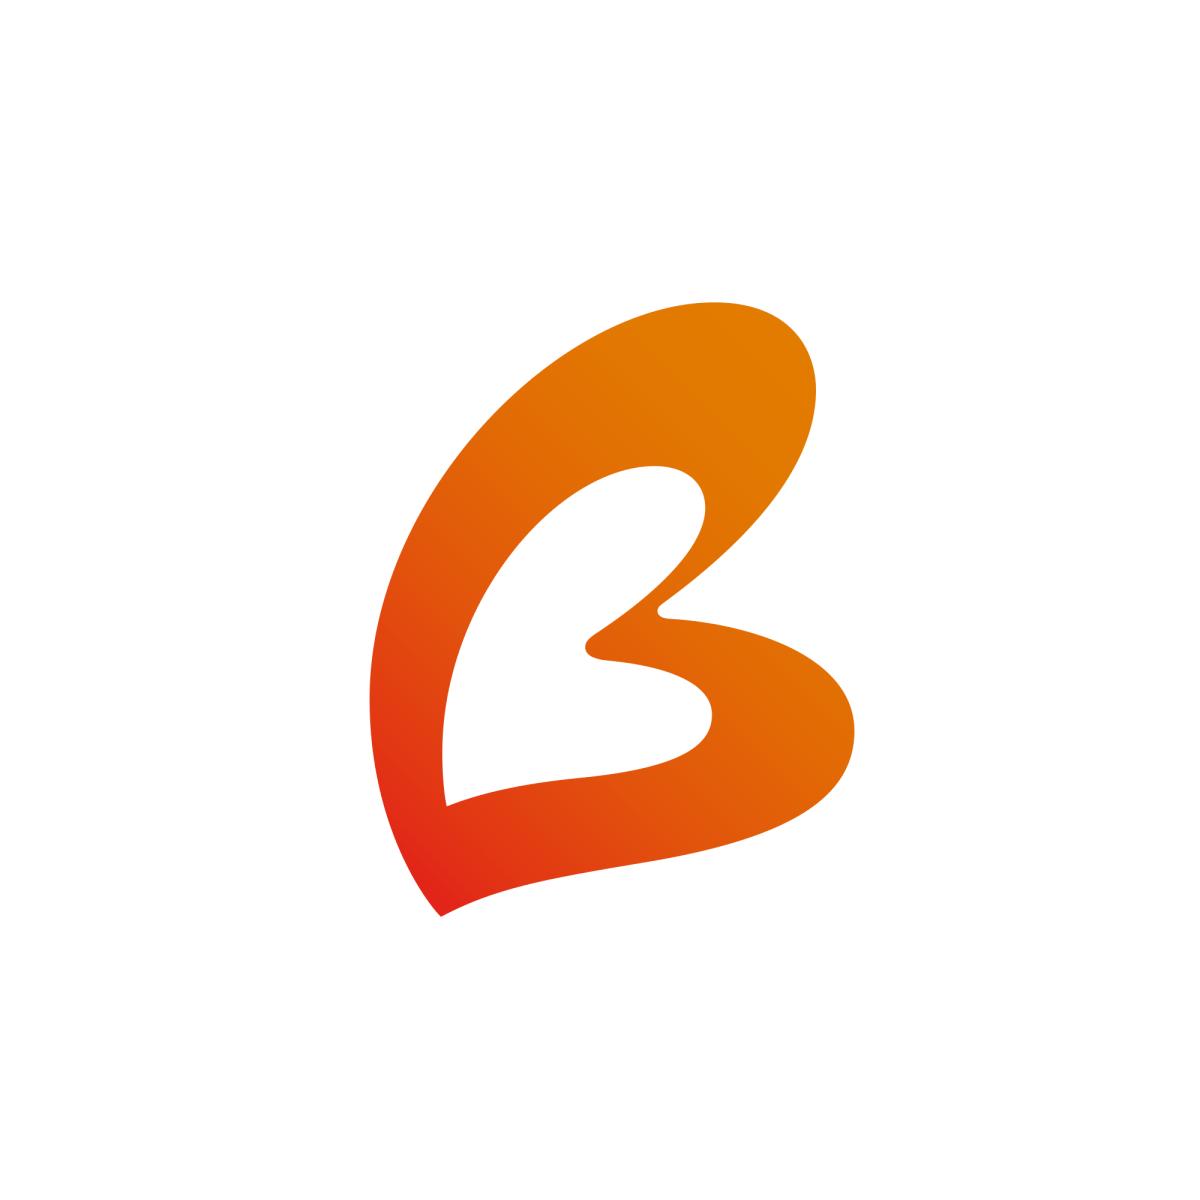 Bethpage Logo United States Letter Logo Single Letter Logo Letter B